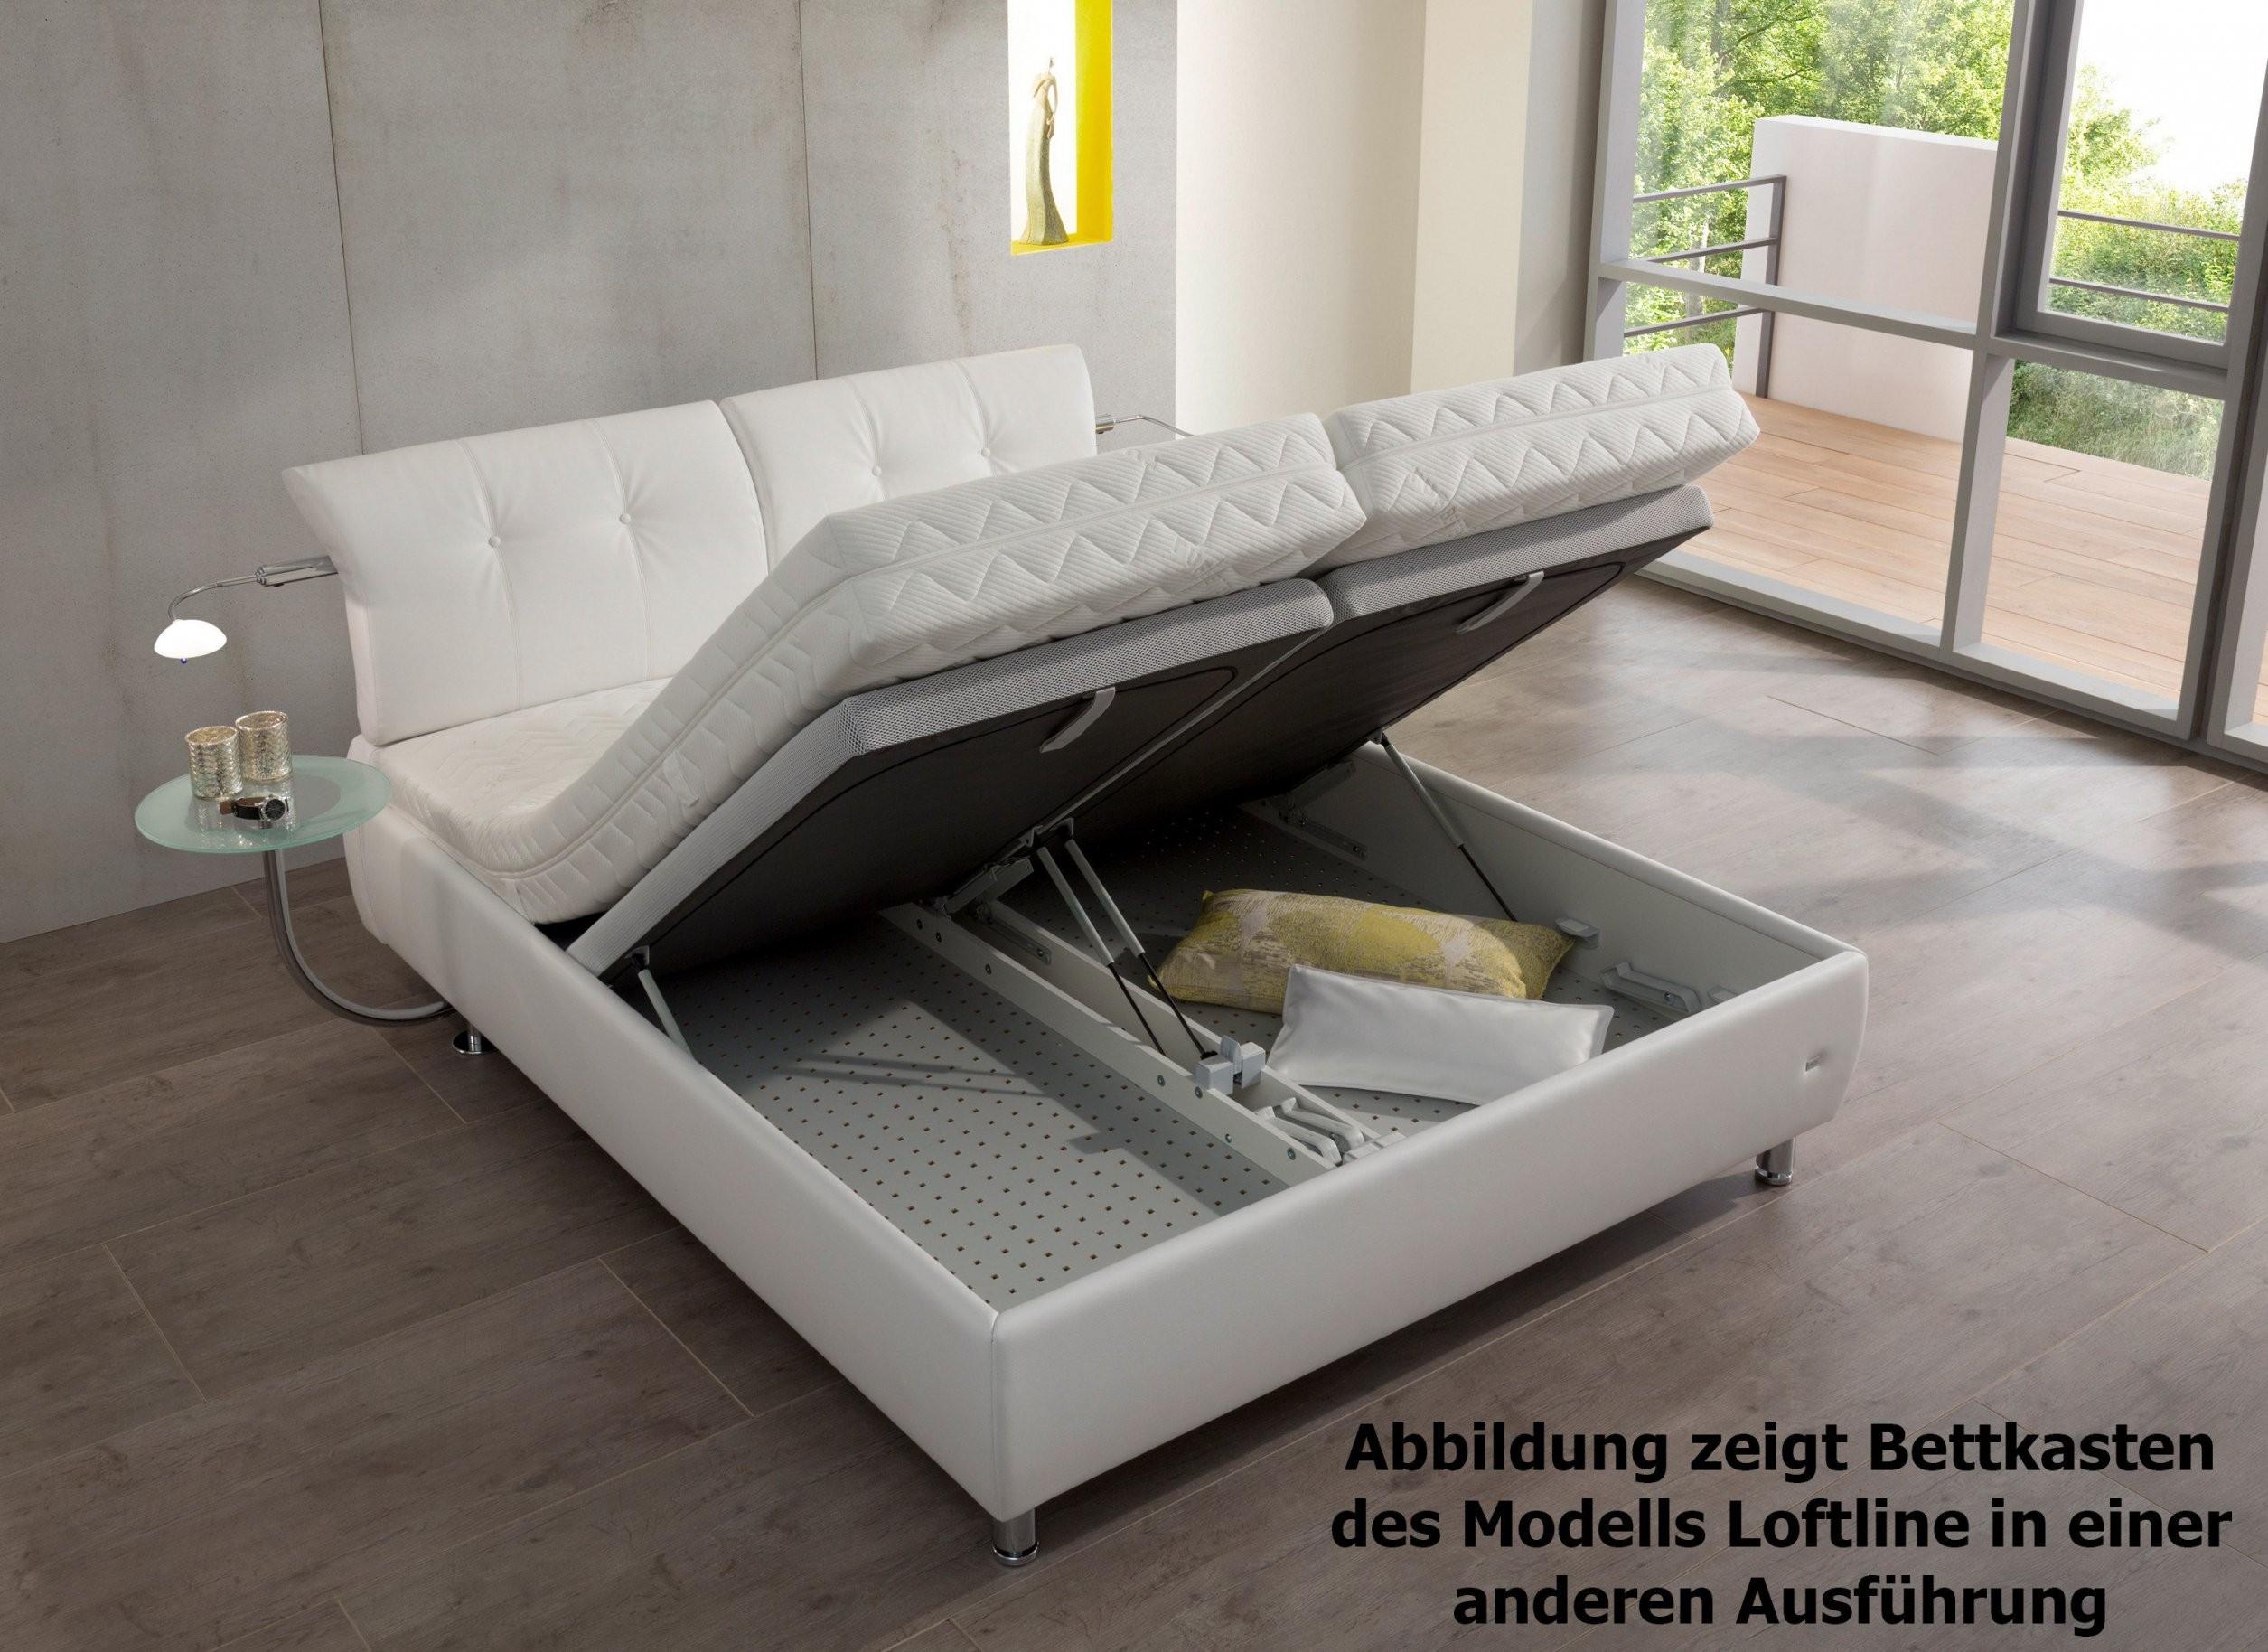 Ruf Polsterbett Loftline Mit Bettkasten  Möbel Letz  Ihr Onlineshop von Ruf Polsterbetten Mit Bettkasten Bild